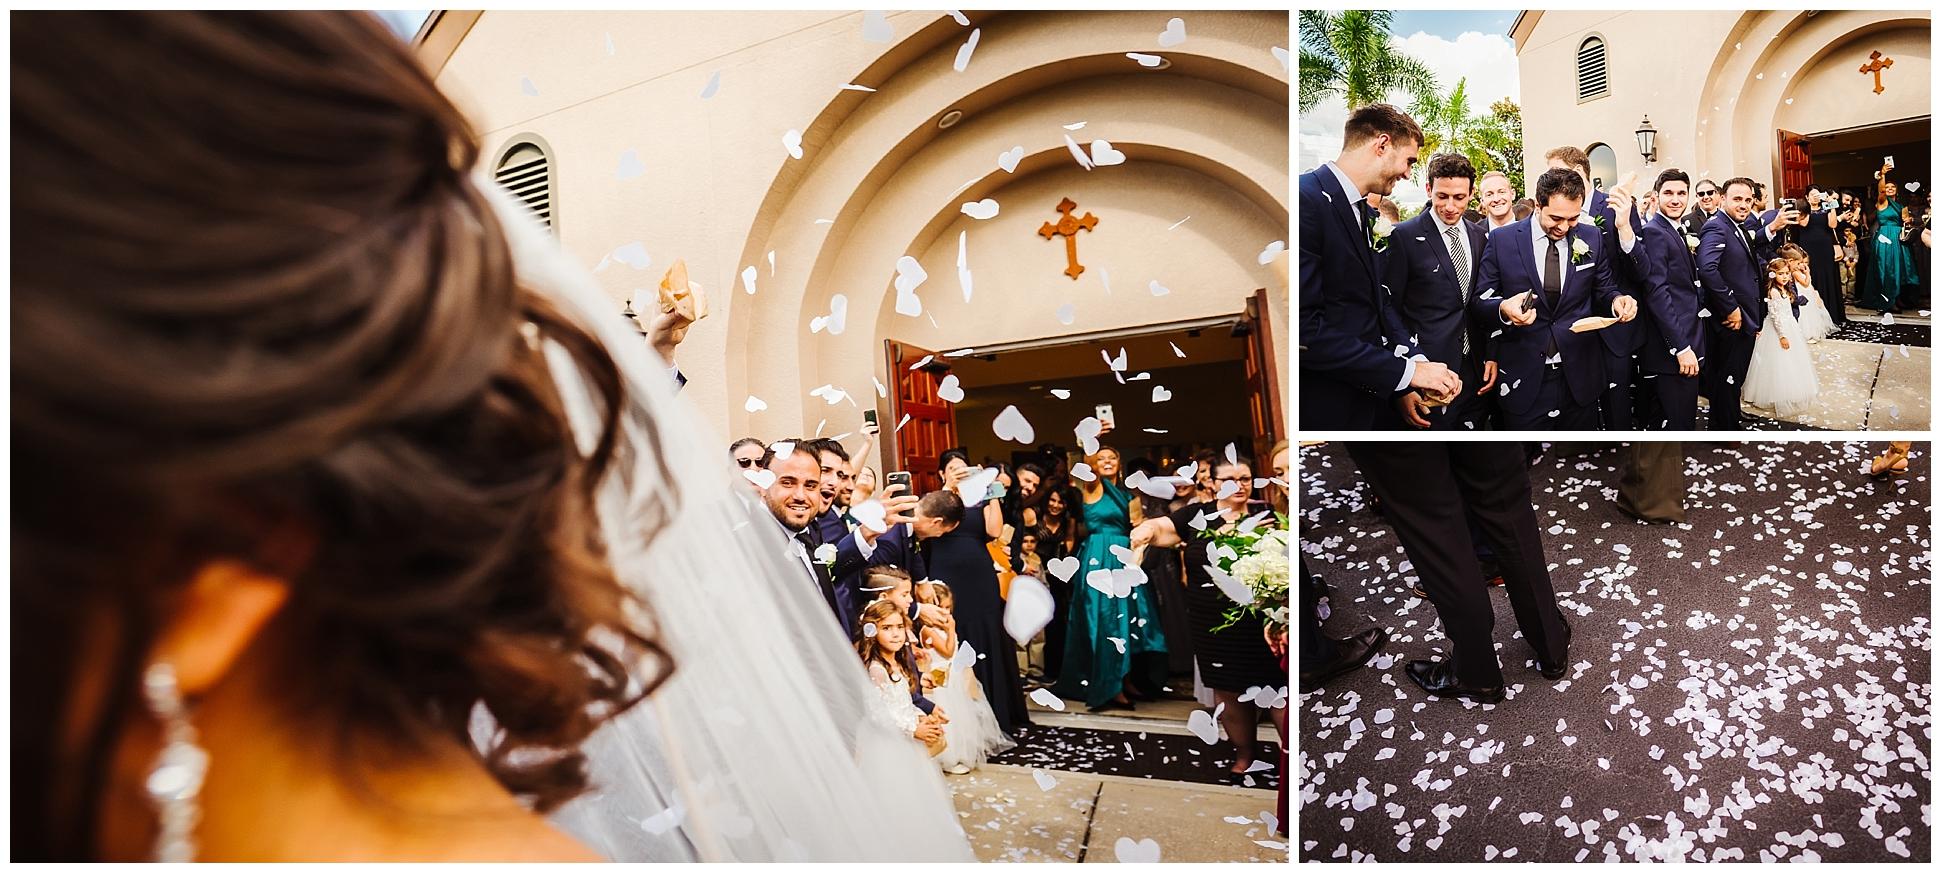 indian-armenian-clearwater-wedding-chic-luxury-photogaphy_0069.jpg